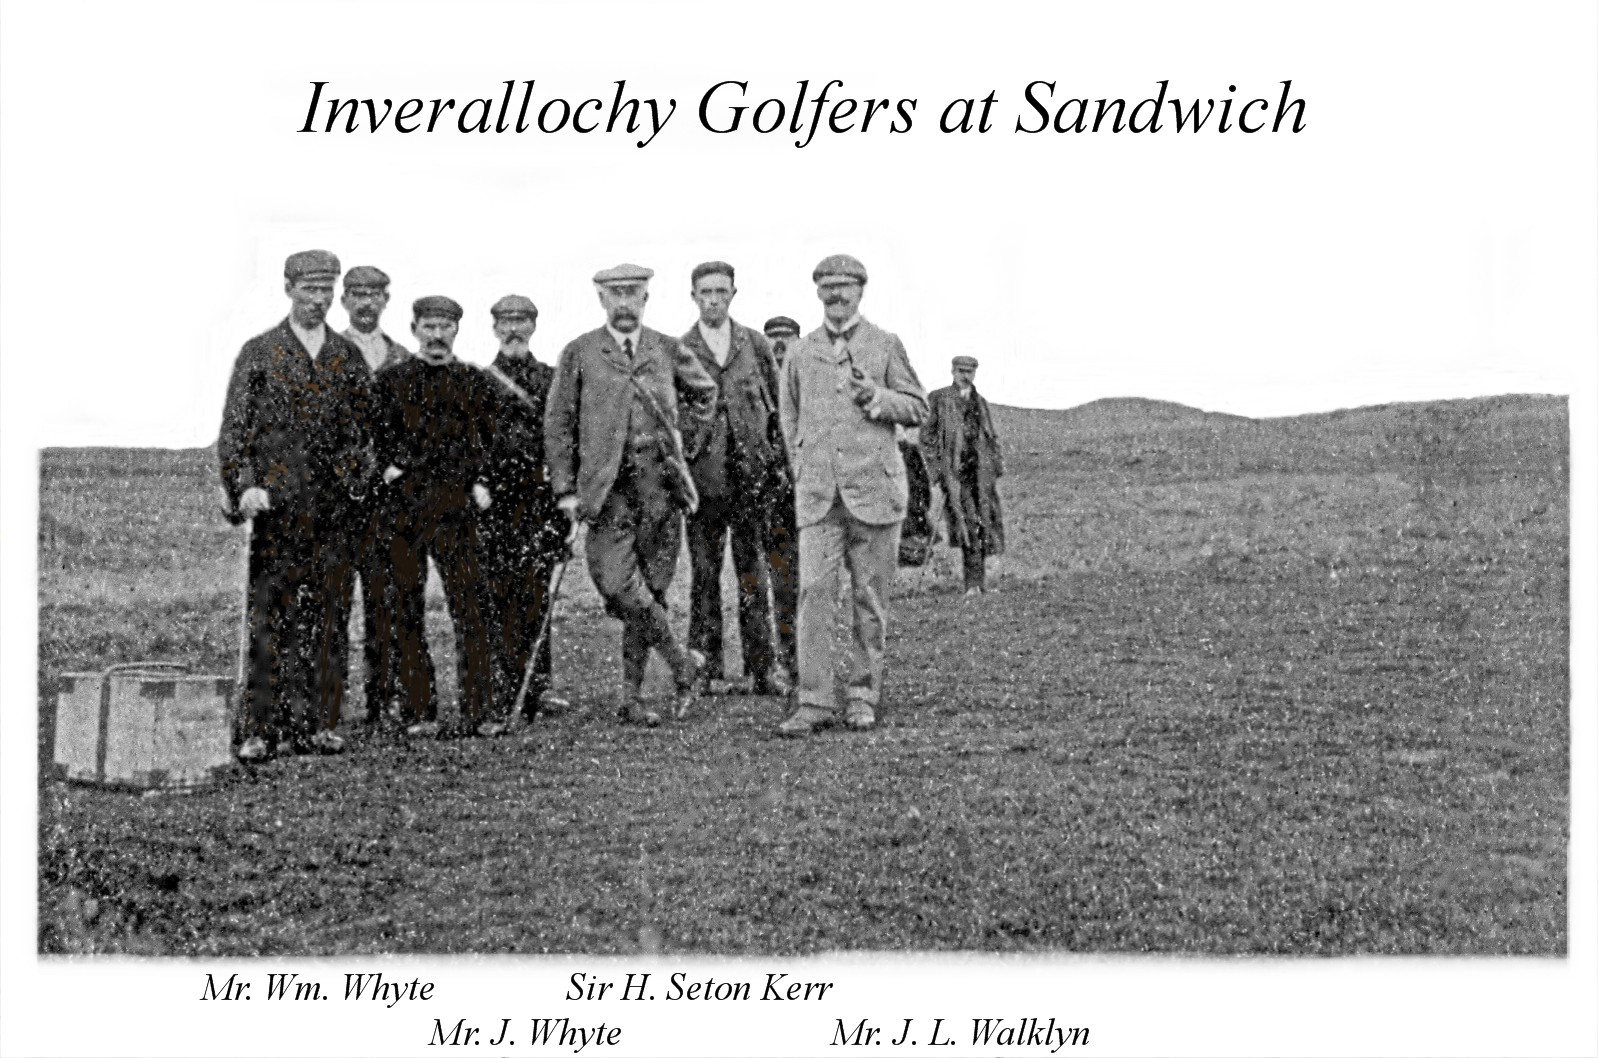 Golfers at Sandwich